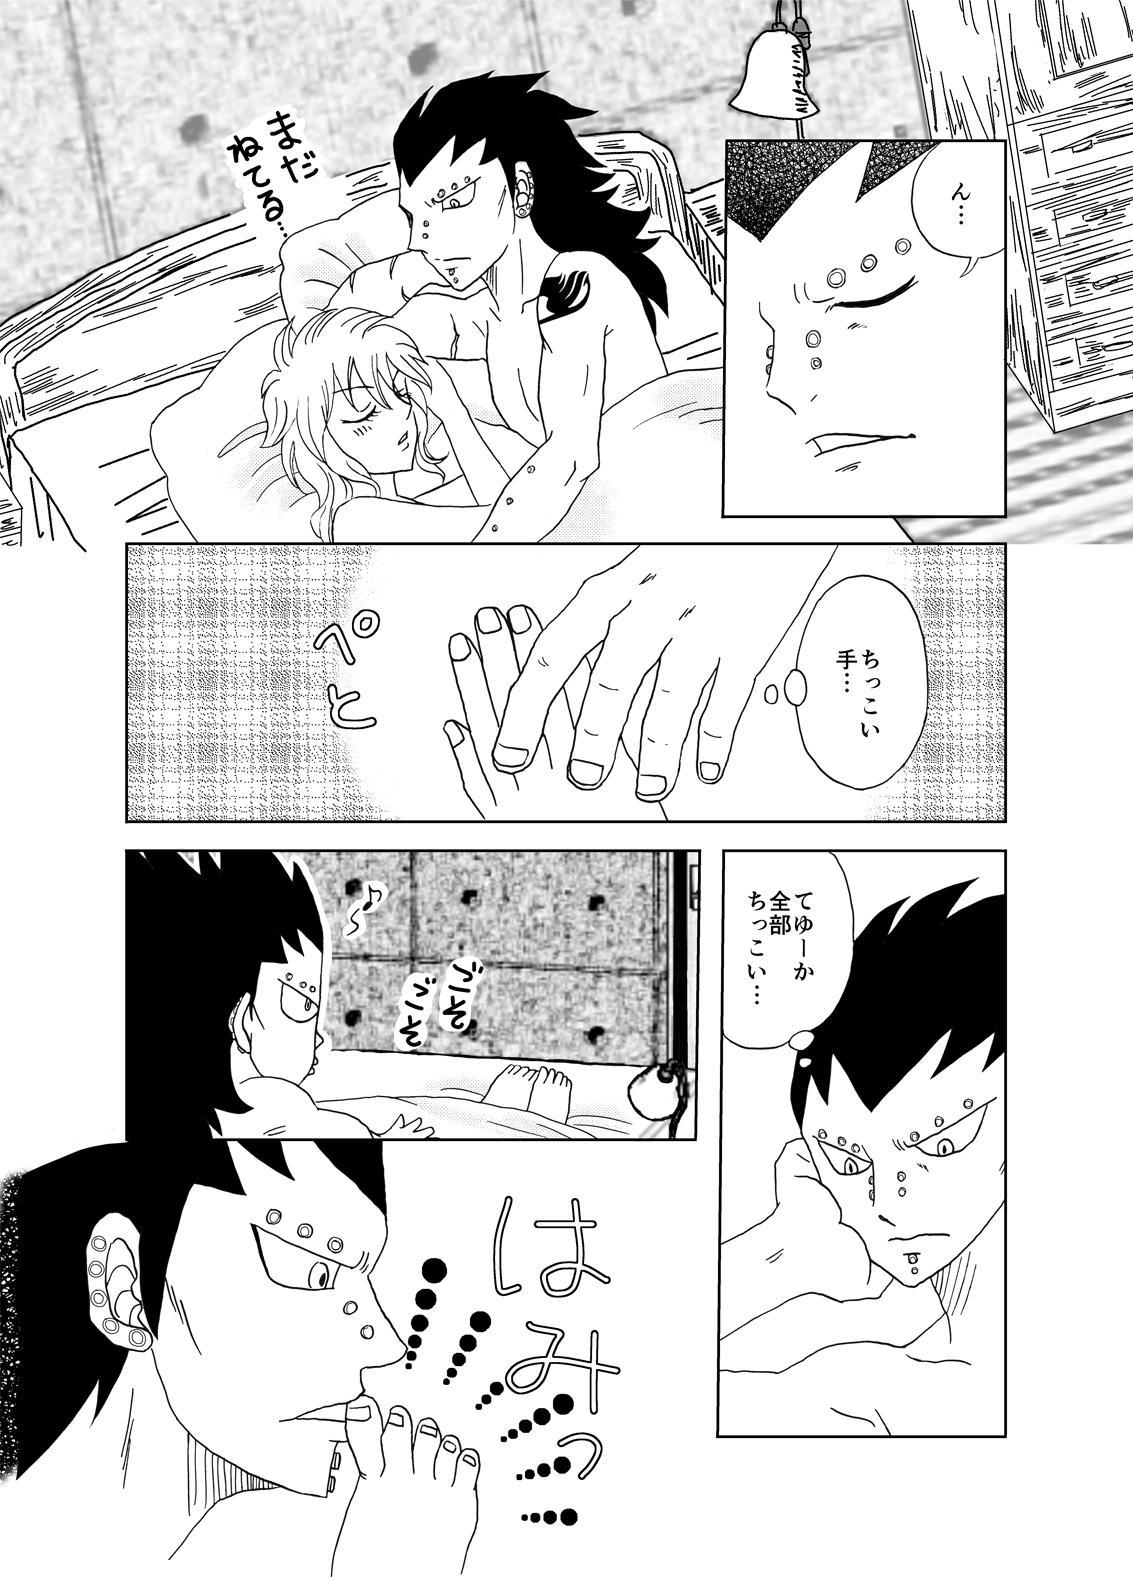 [Cashew] GajeeLevy Manga - Levy-chan ni Gohoushi (Fairy Tail) 1